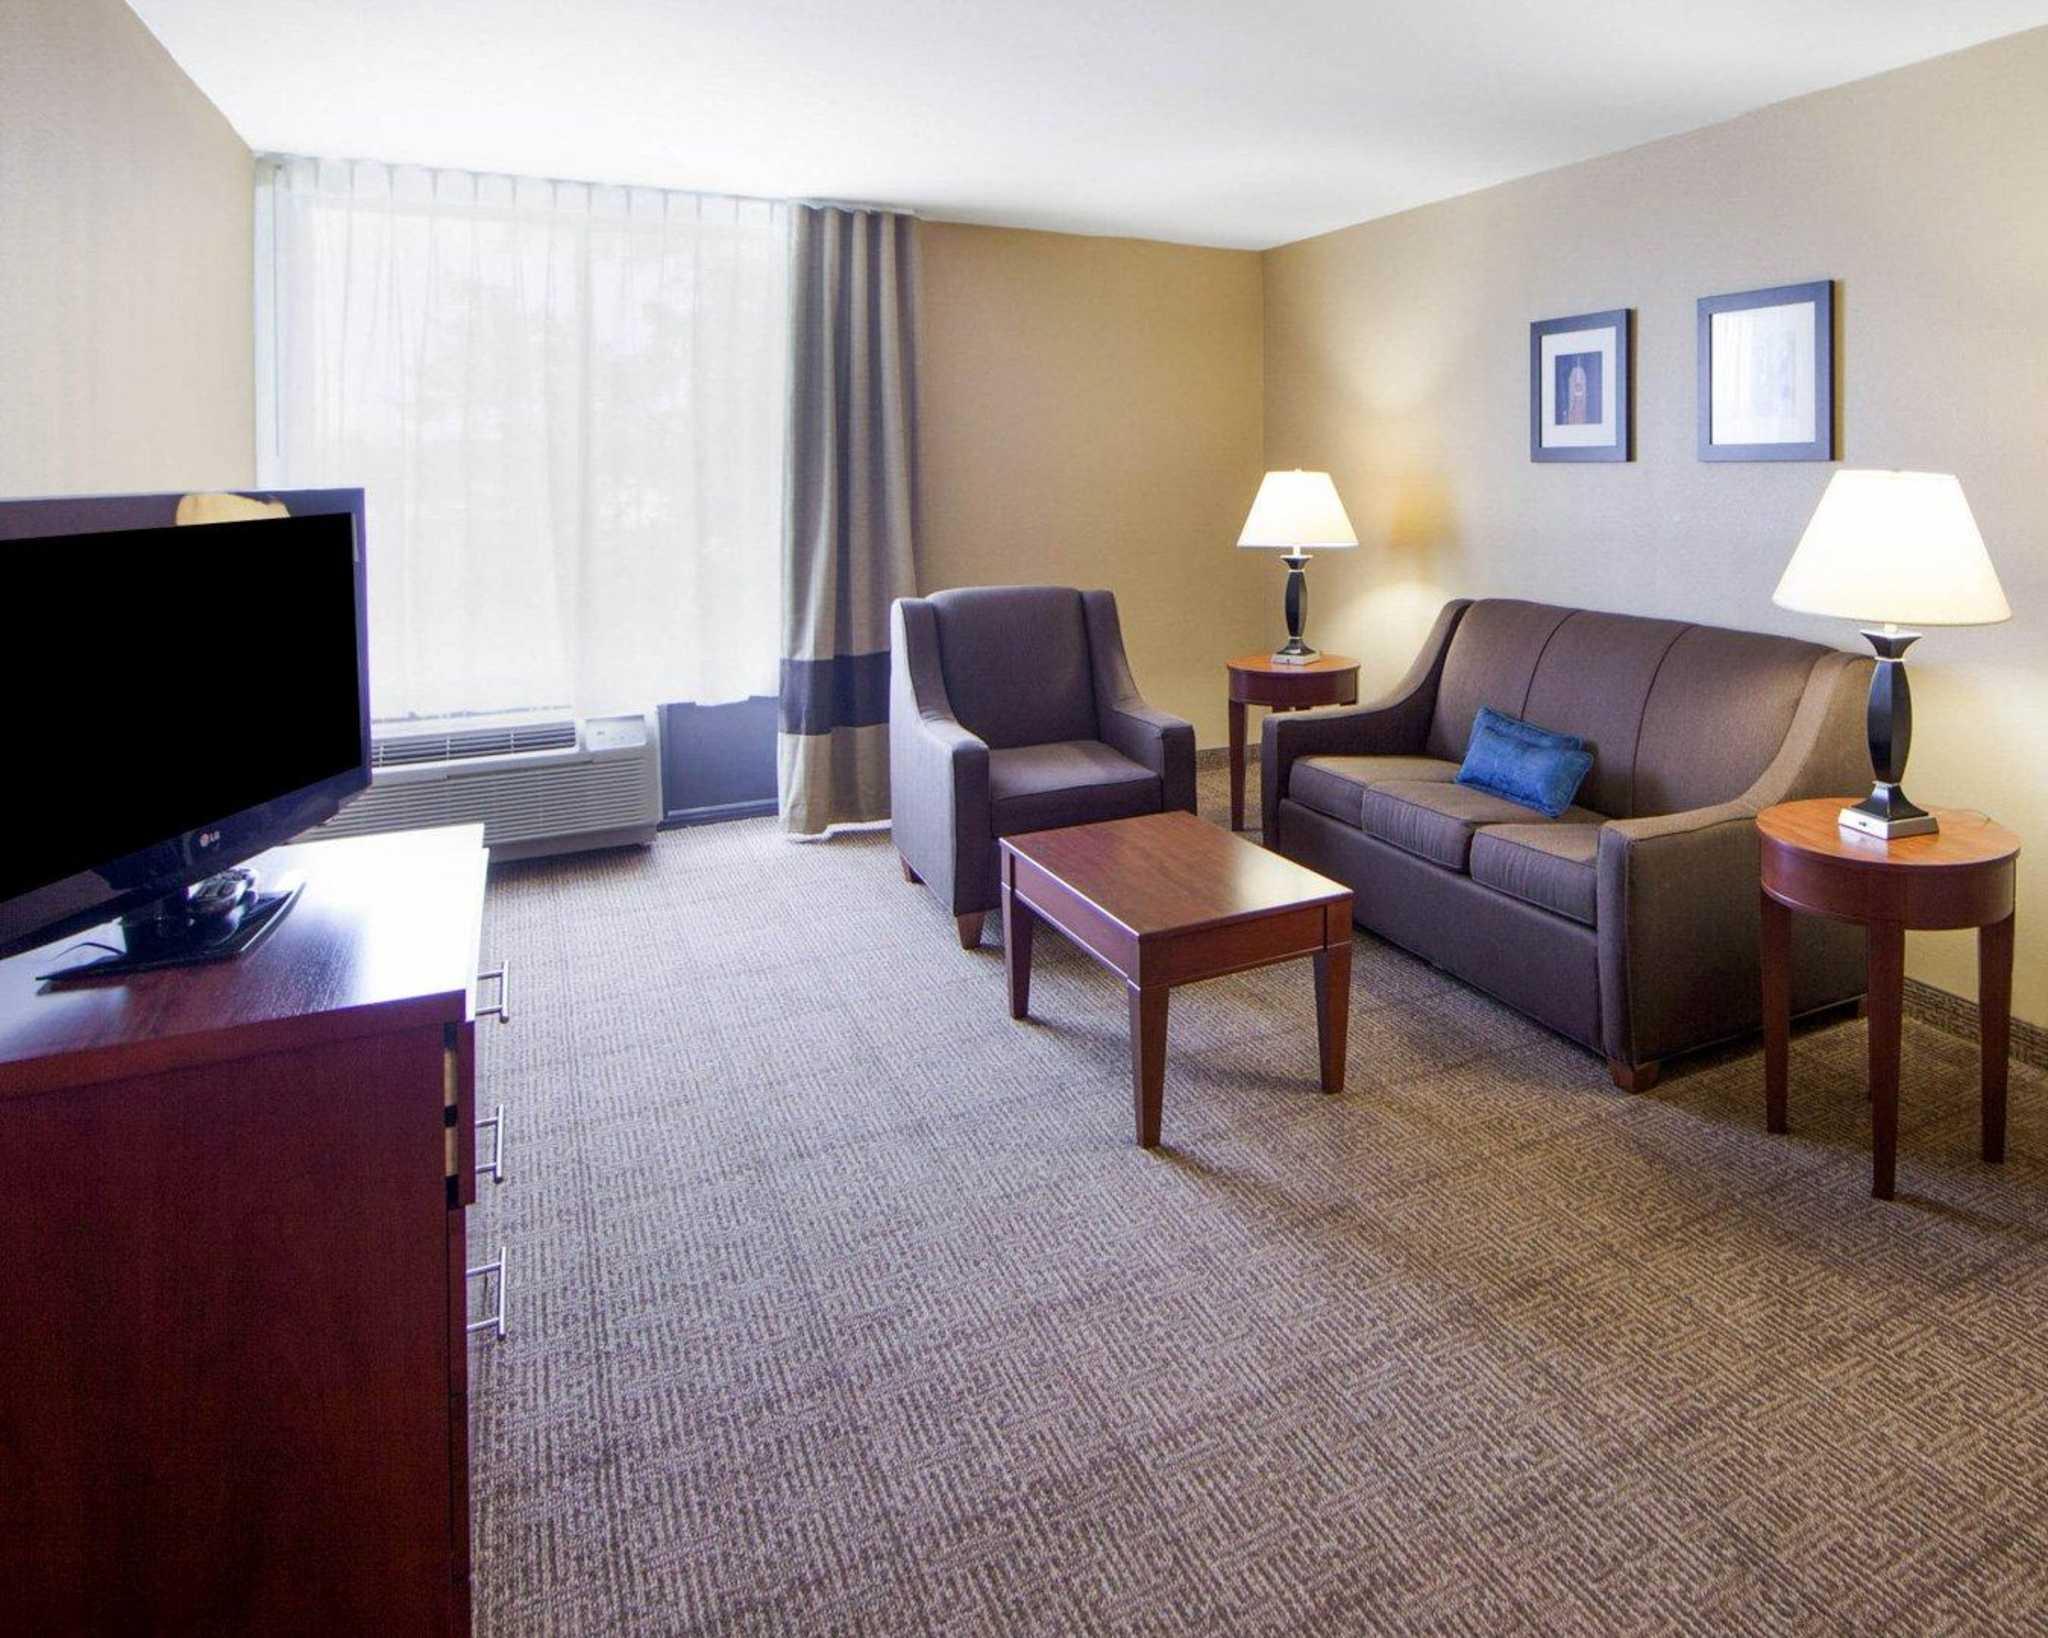 Comfort Inn & Suites Plano East image 53